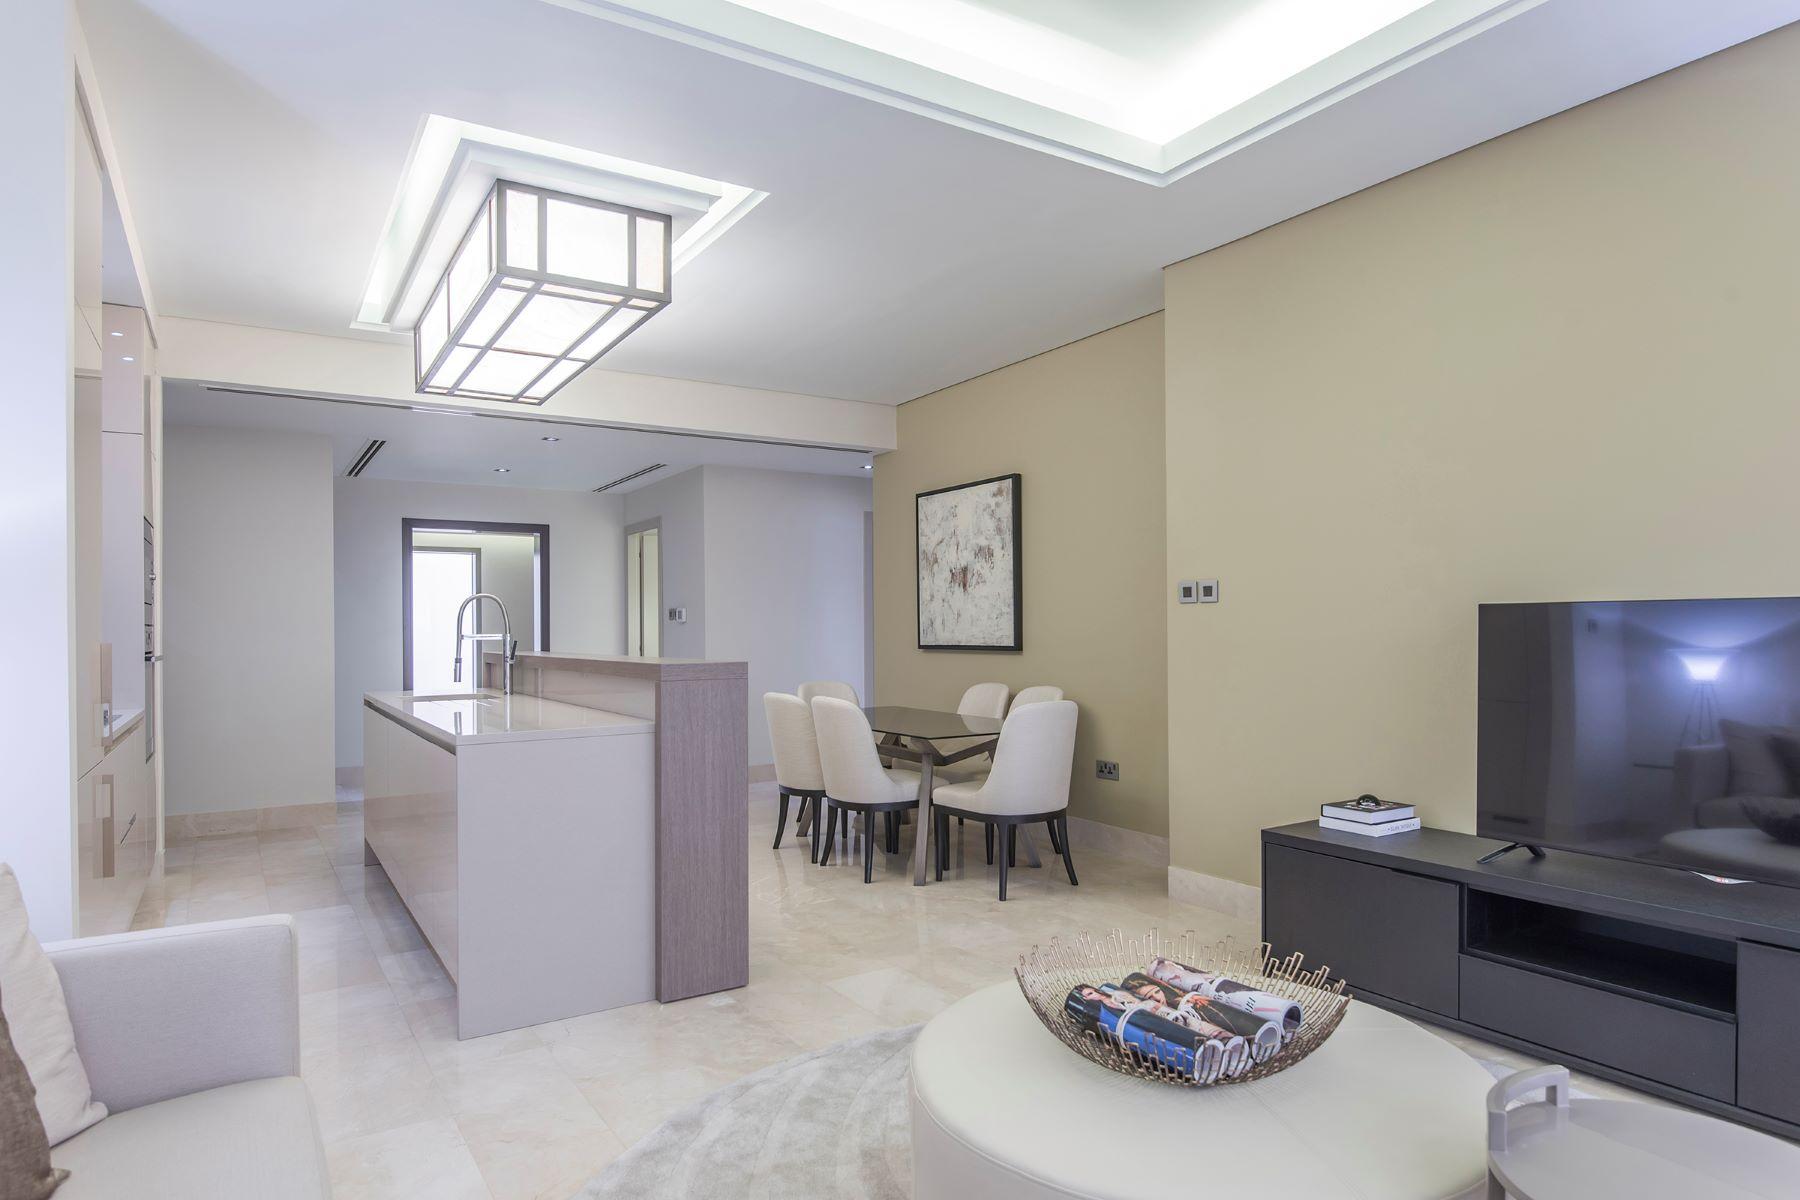 Квартира для того Продажа на Brand New Three Bedroom With Sea Views Palm Jumeirah The 8, Dubai, 00000 Объединенные Арабские Эмираты